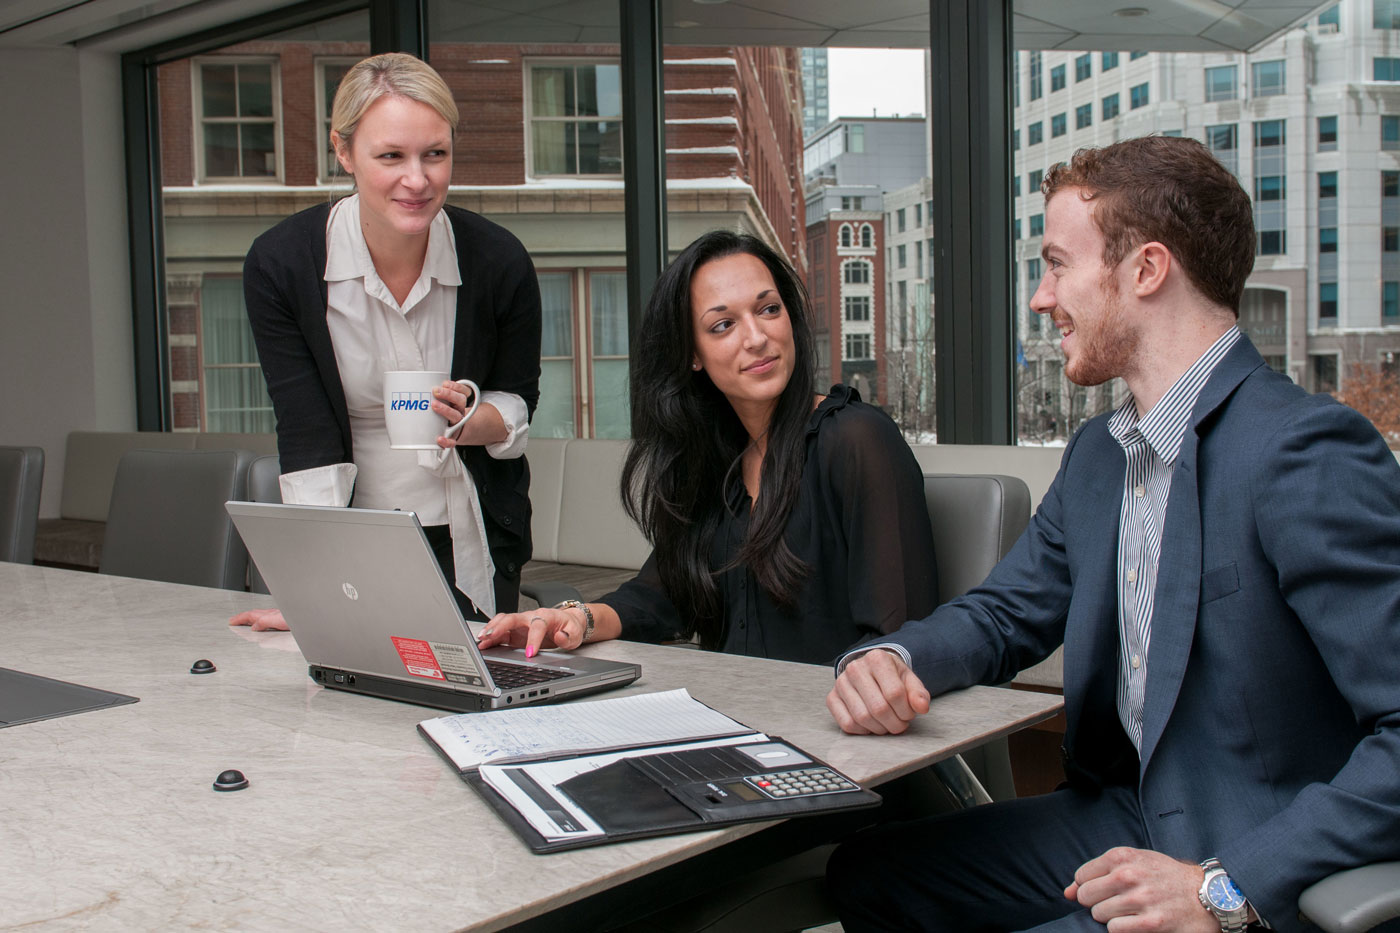 UMass graduates in a business setting